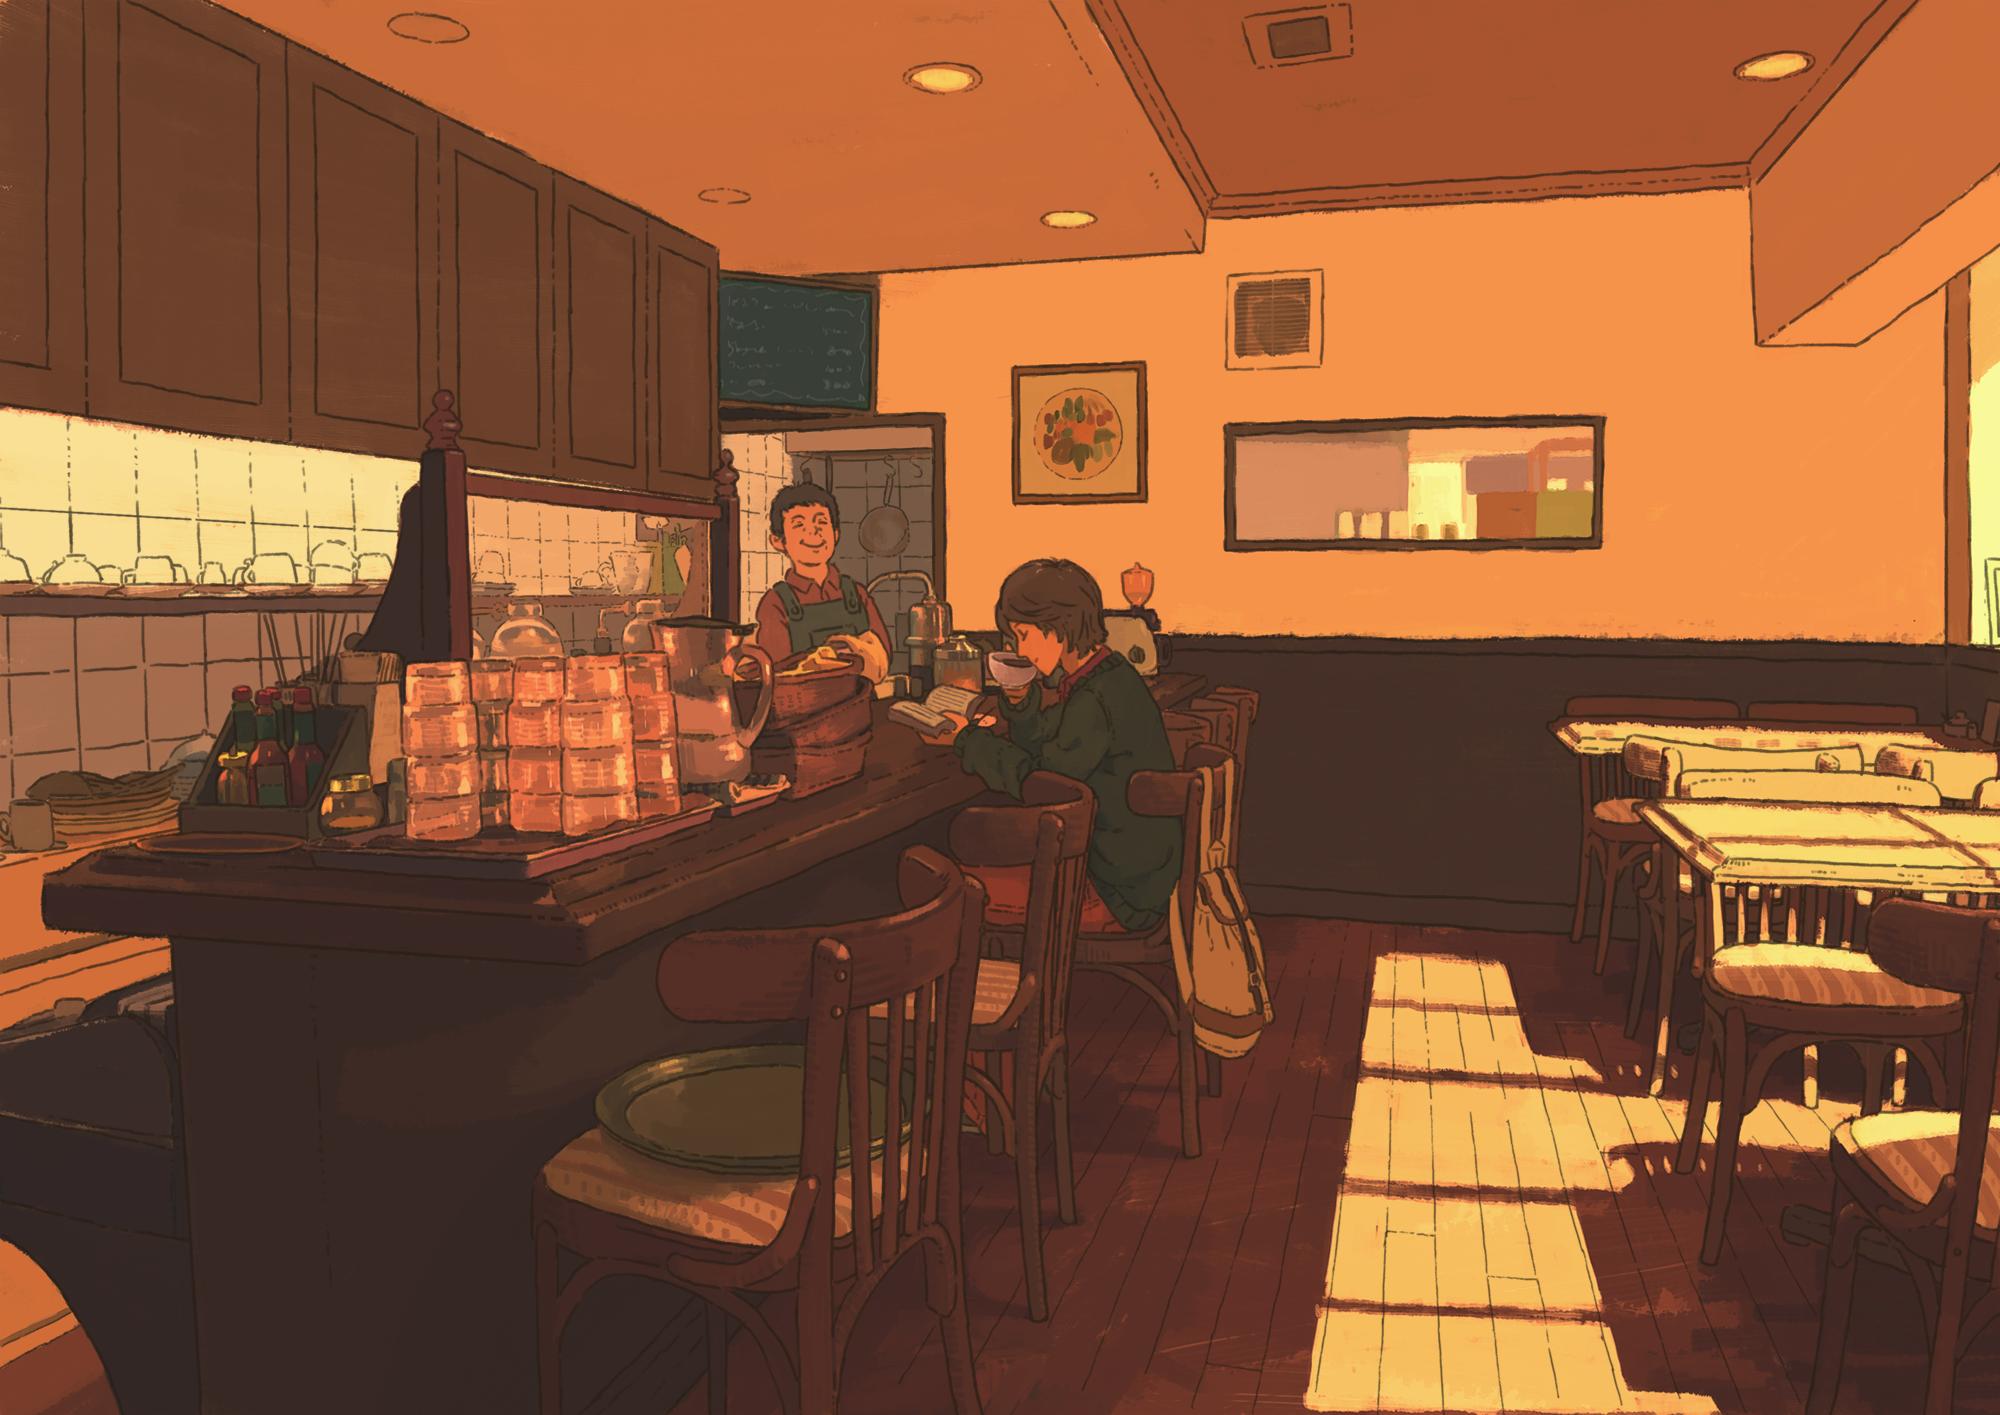 Wallpaper Japan Anime Room Restaurant Cafes Interior